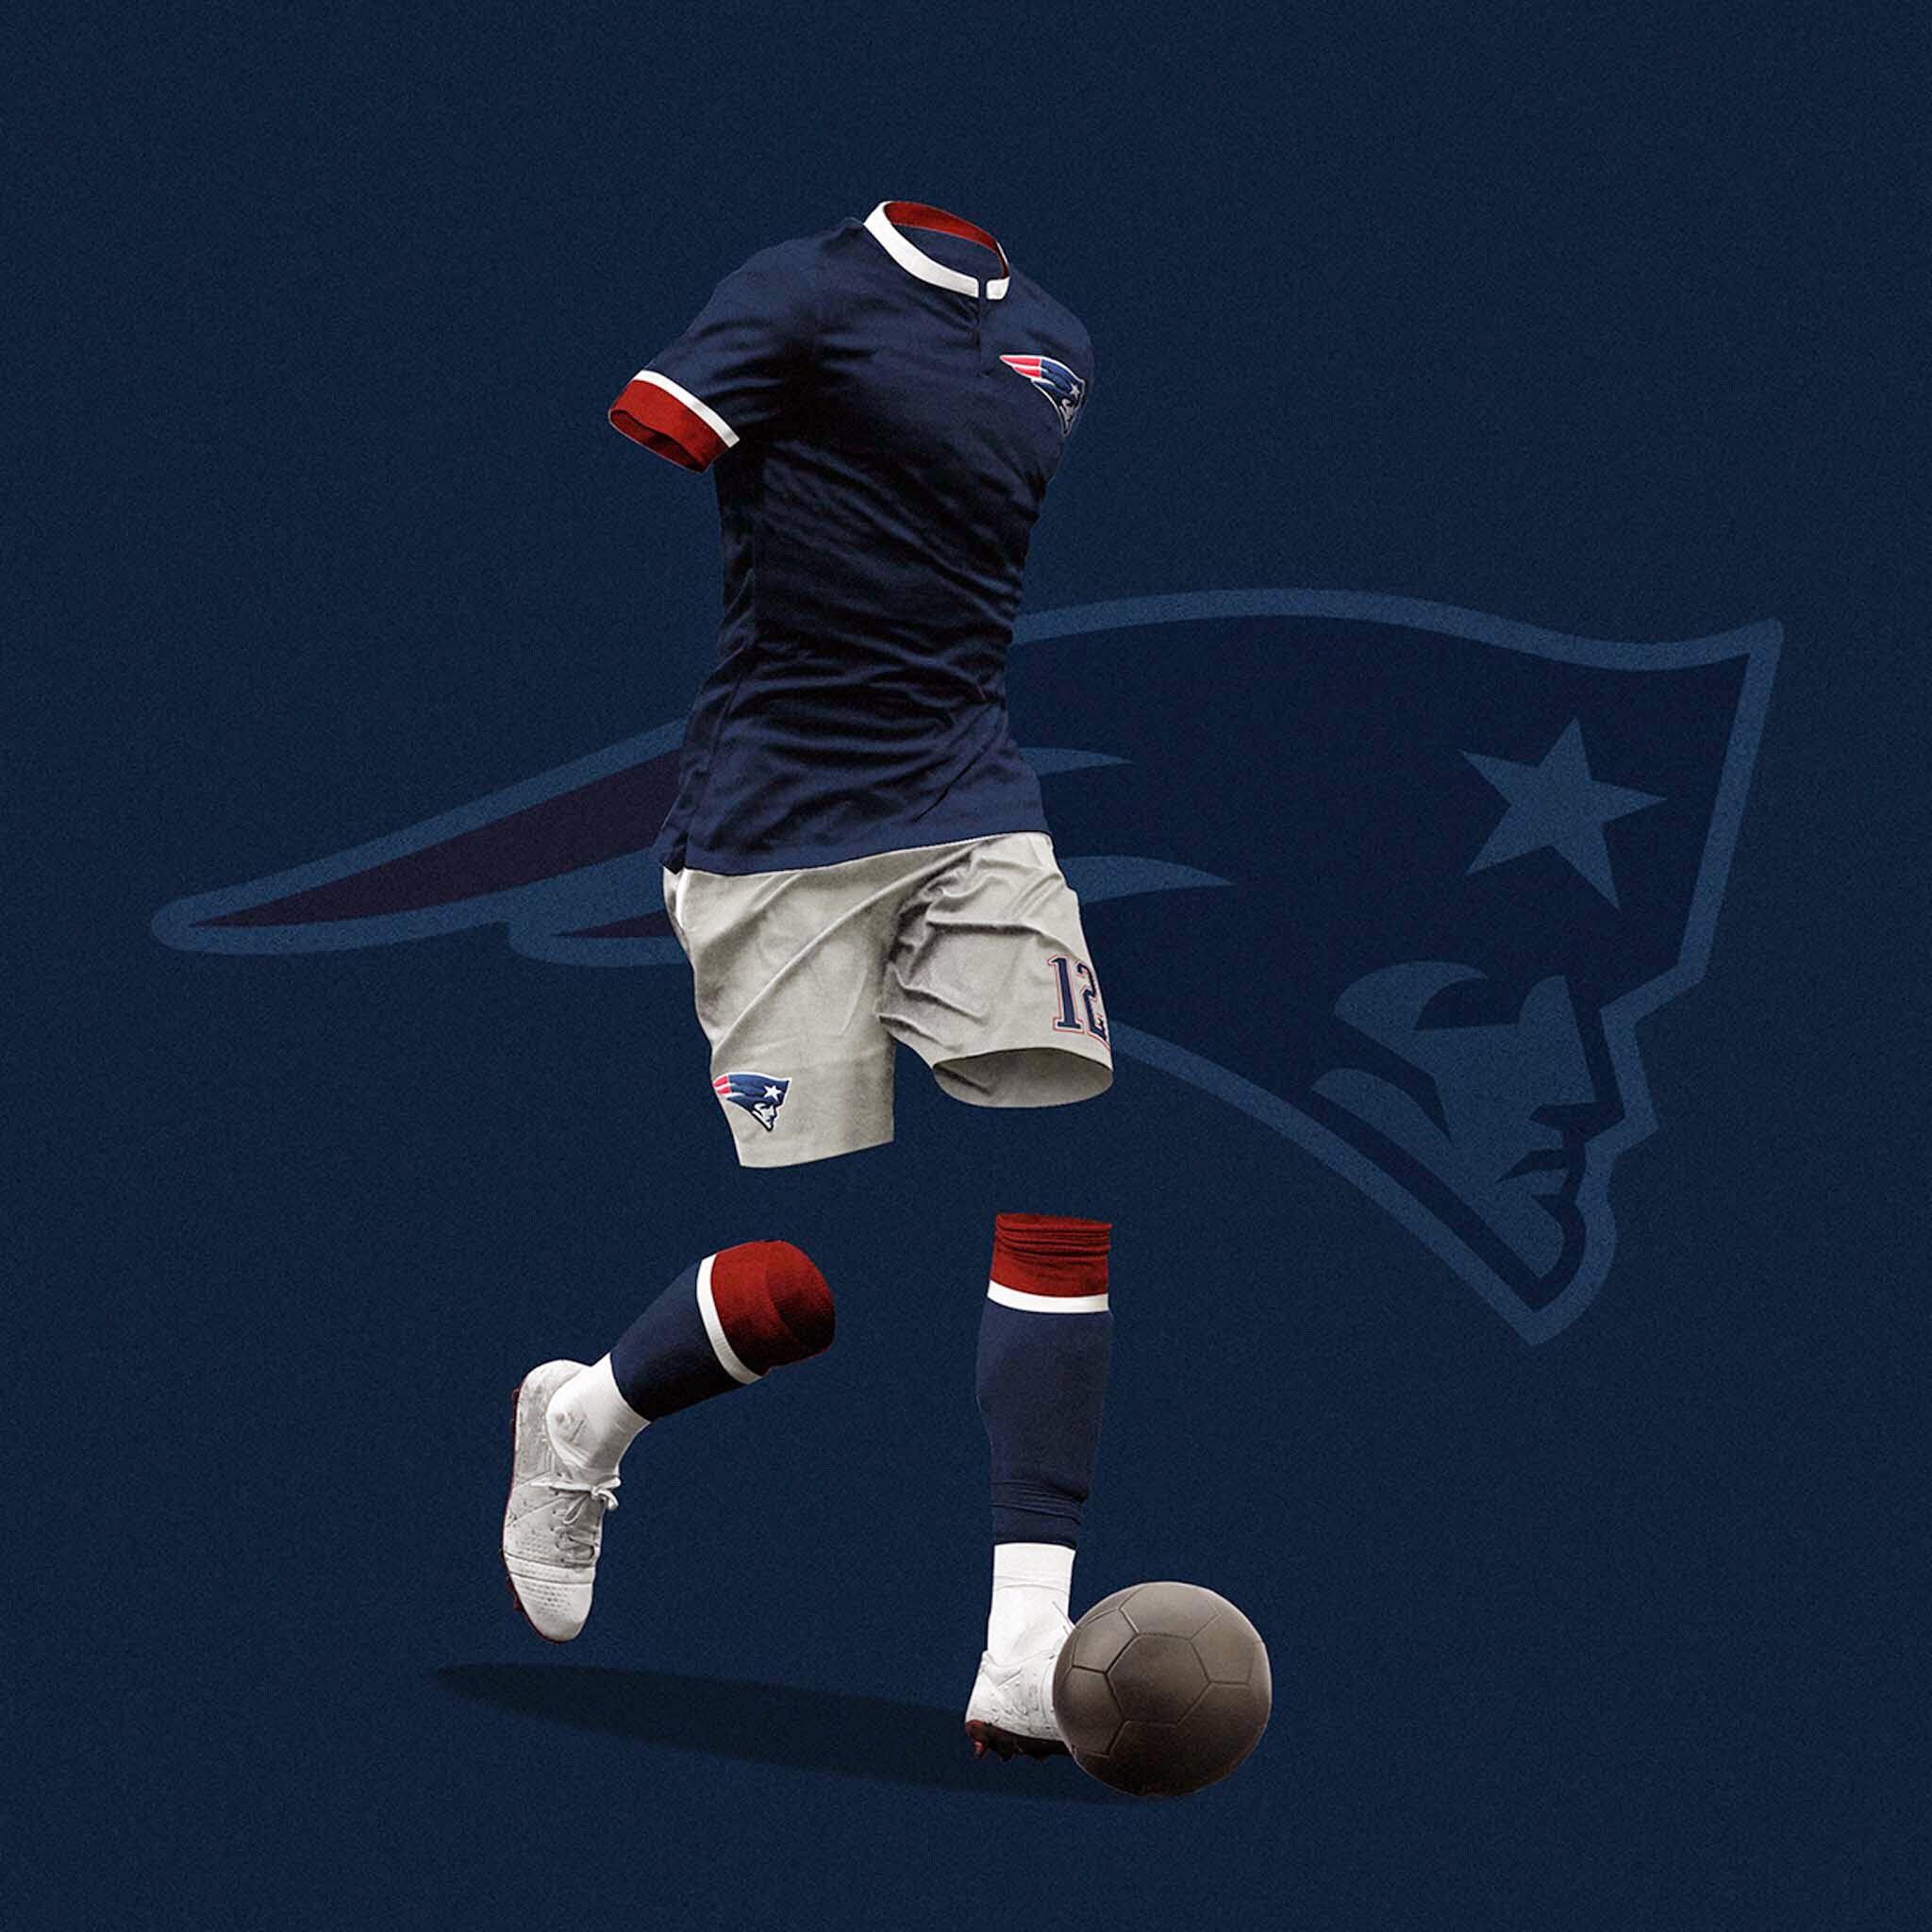 f1a20279dbd New England Patriots soccer uniform | Boston: My Home | Soccer ...